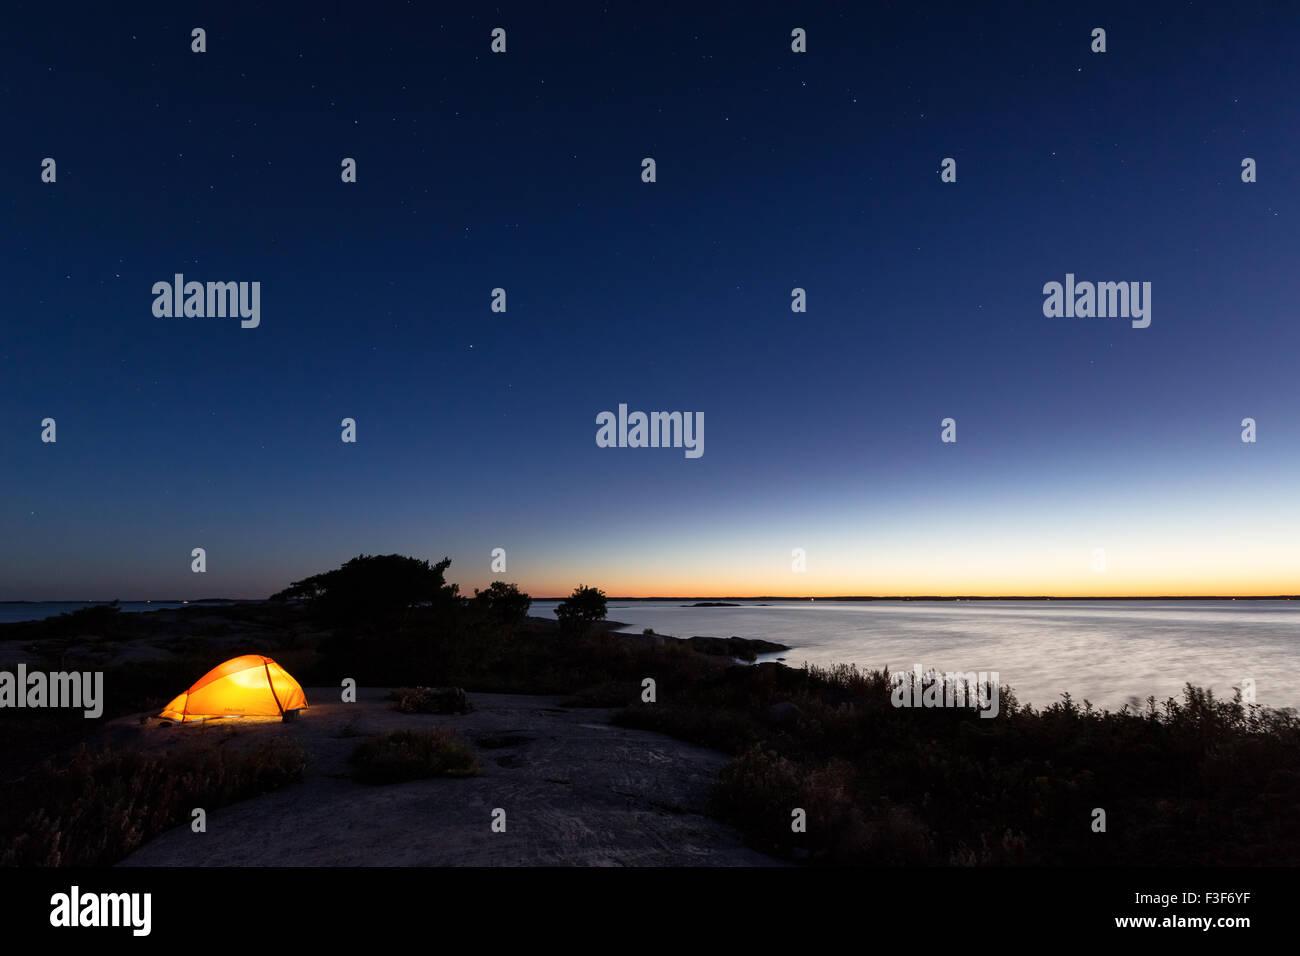 La nuit arrive à l'île de Örskär, Espoo, Finlande, Europe, UNION EUROPÉENNE Photo Stock